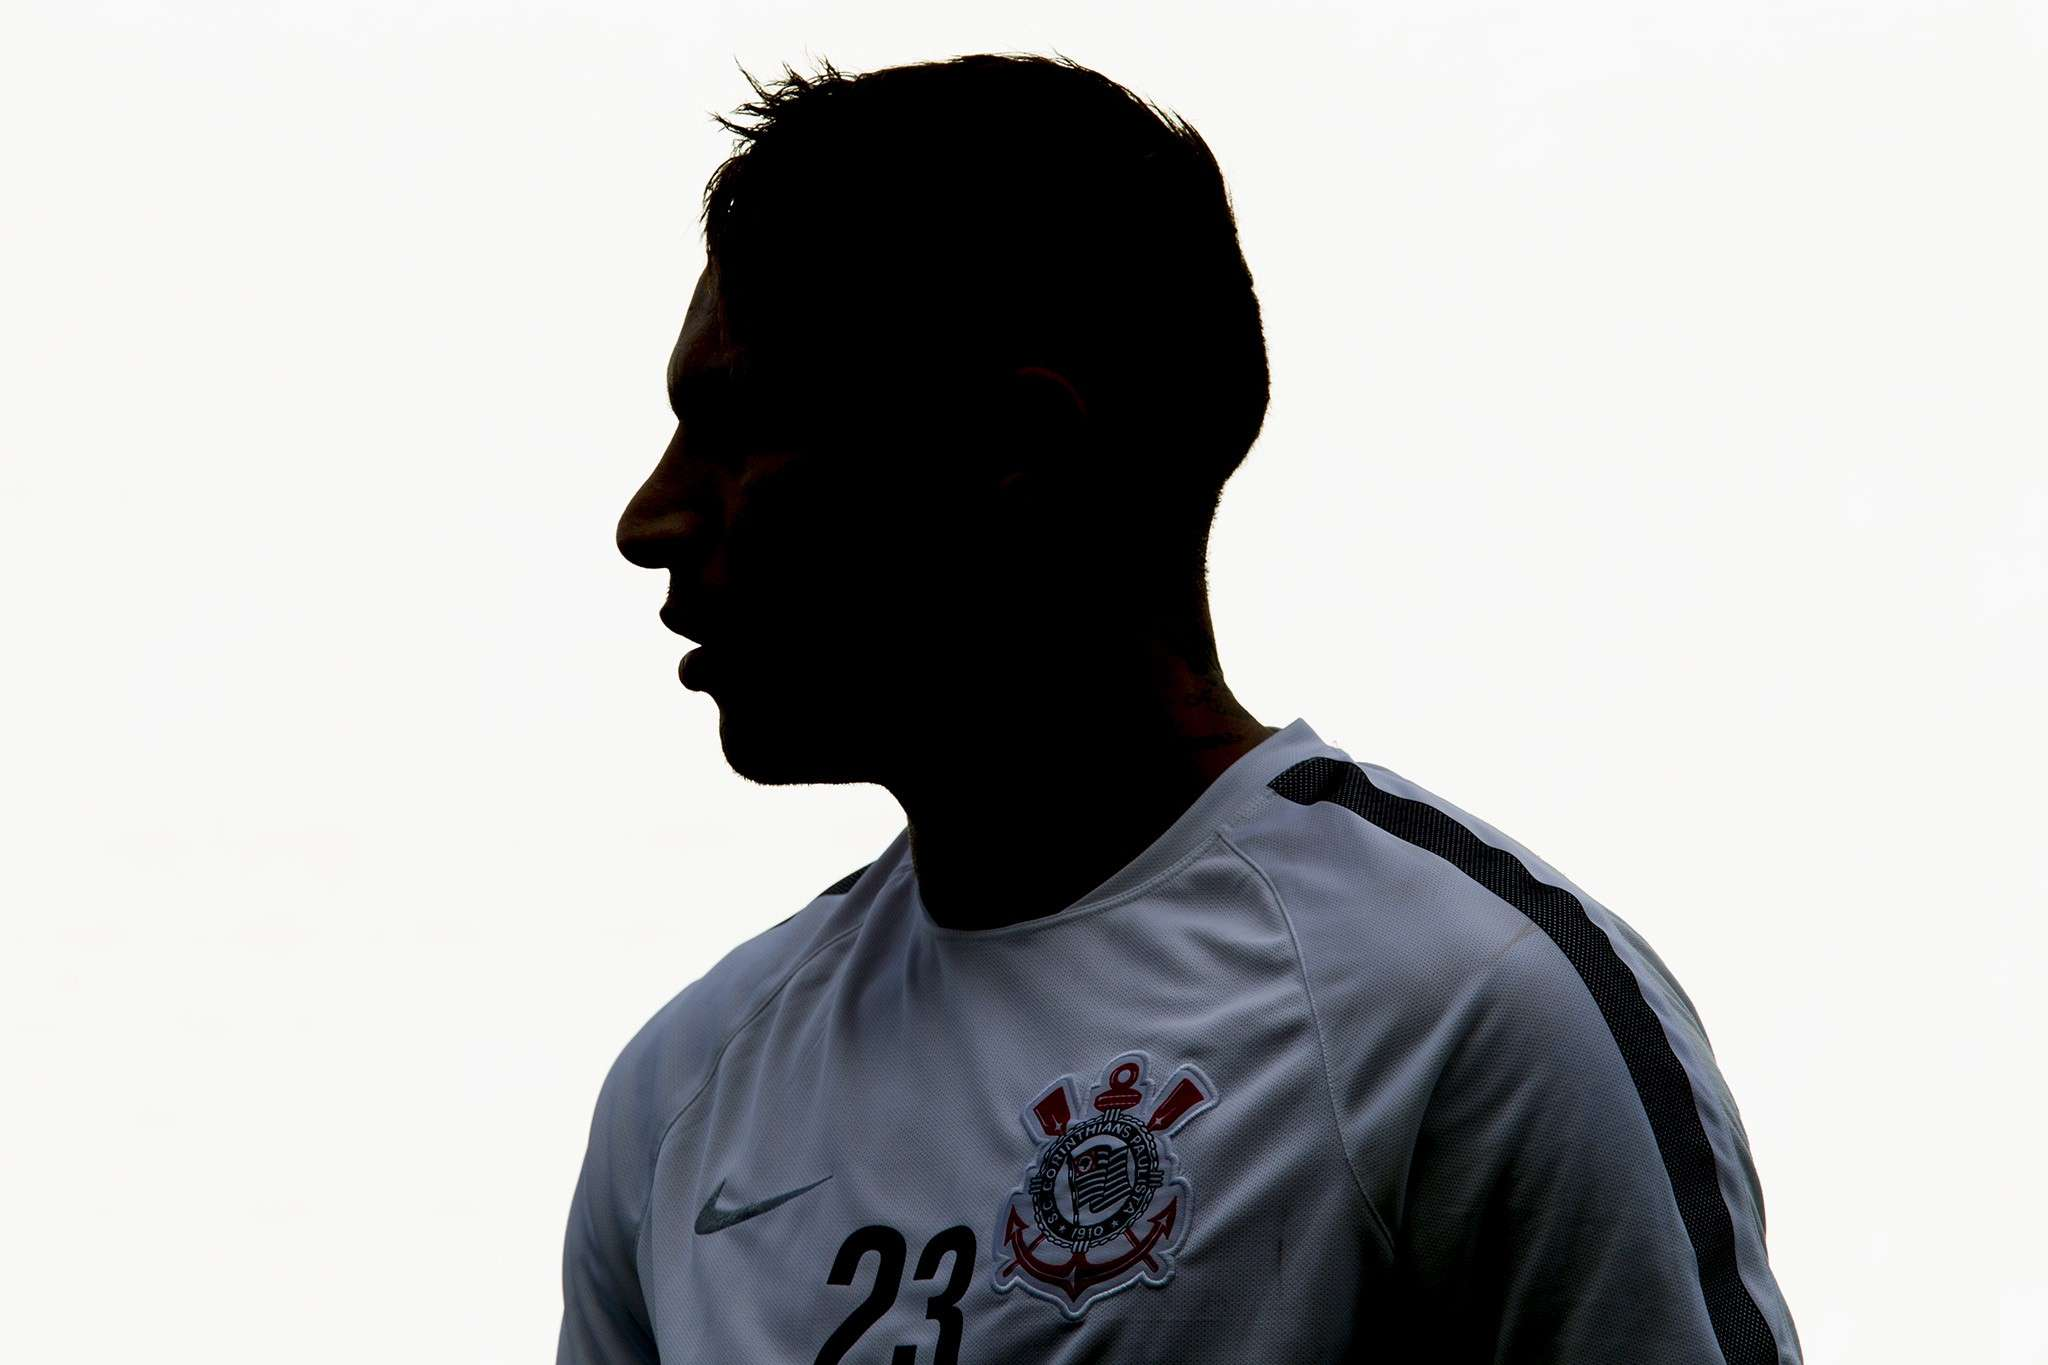 Guerrero participa de treino do Corinthians Foto: Daniel Augusto Jr./Ag. Corinthians